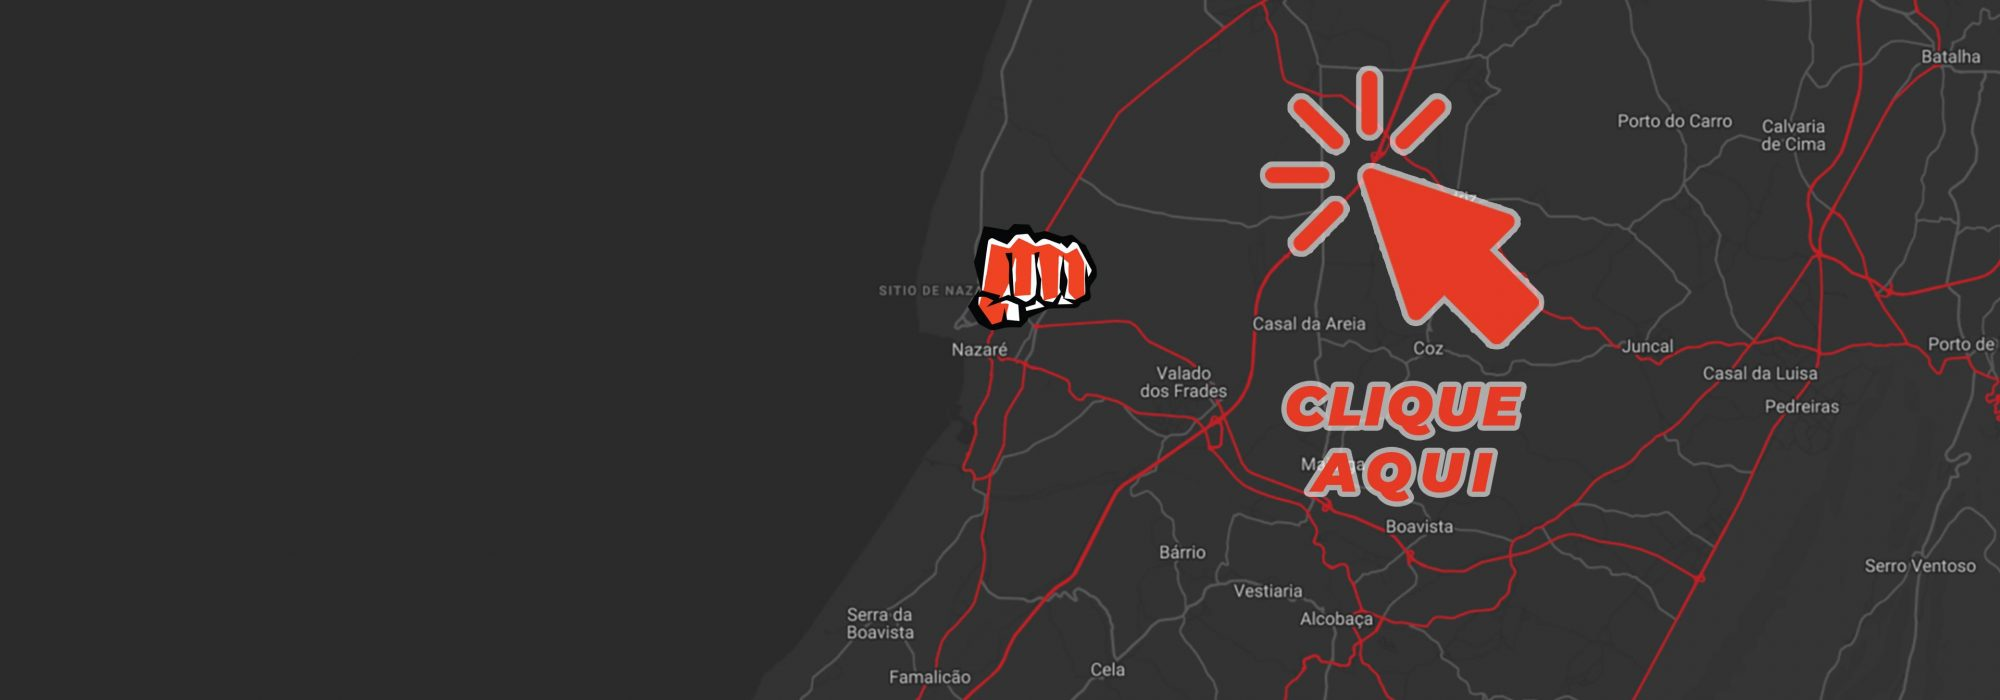 4k-map-nazare